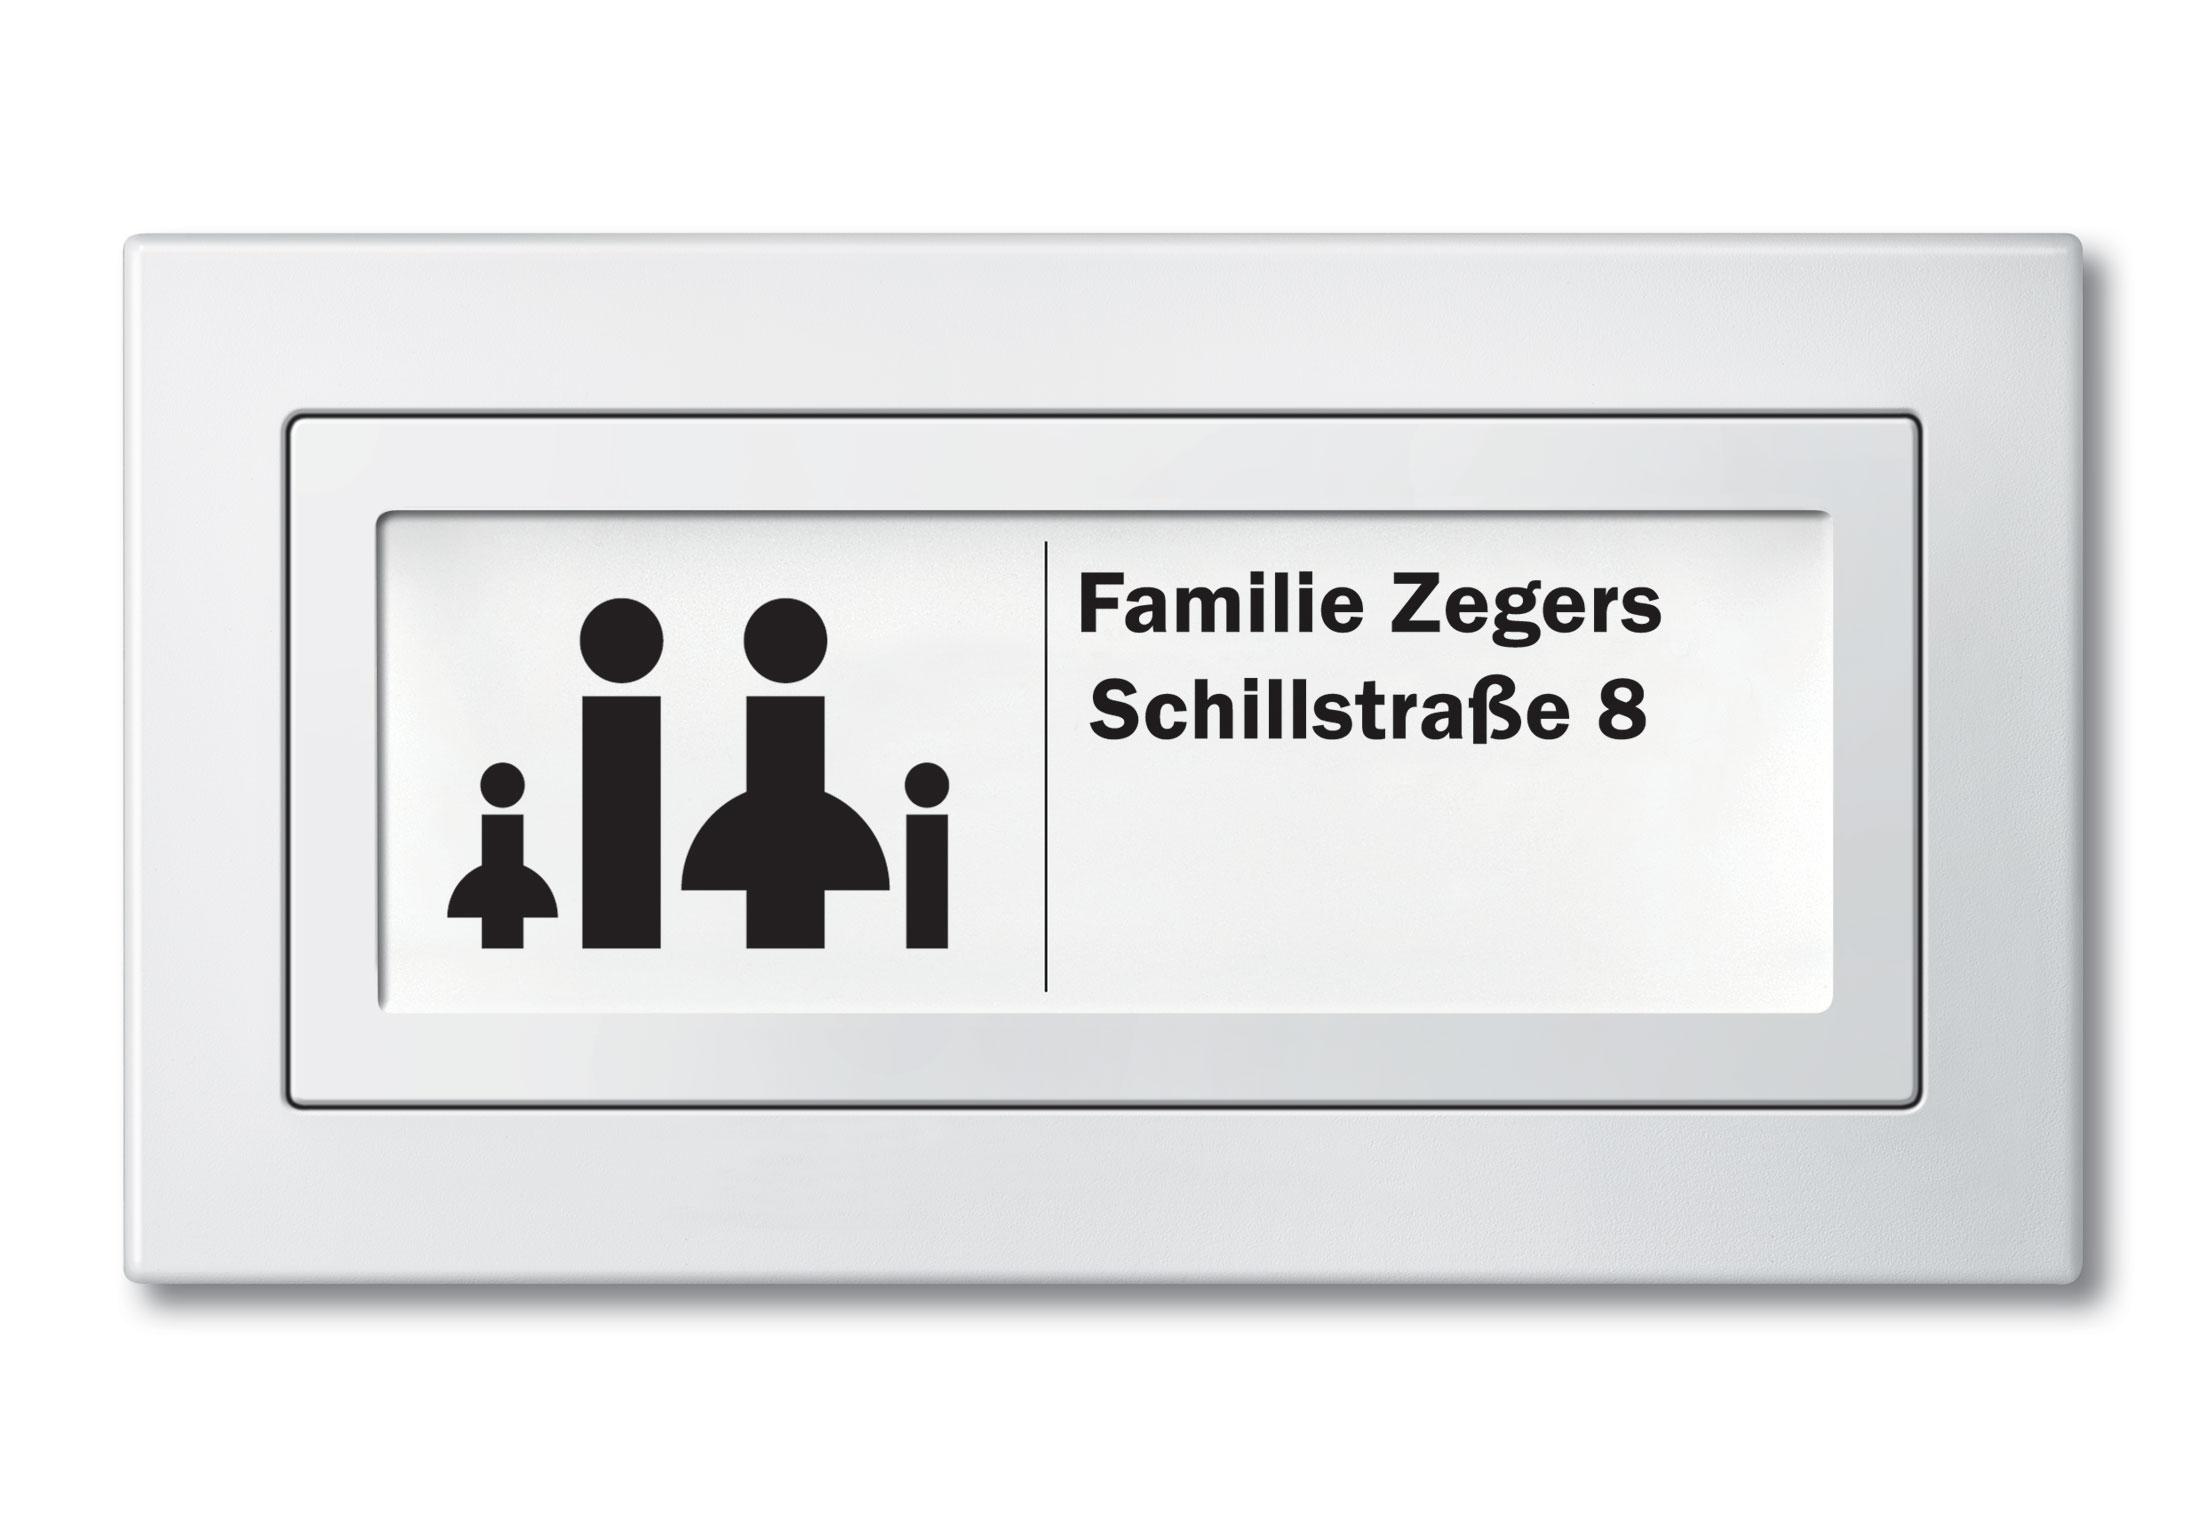 m plan orientation system by merten stylepark. Black Bedroom Furniture Sets. Home Design Ideas